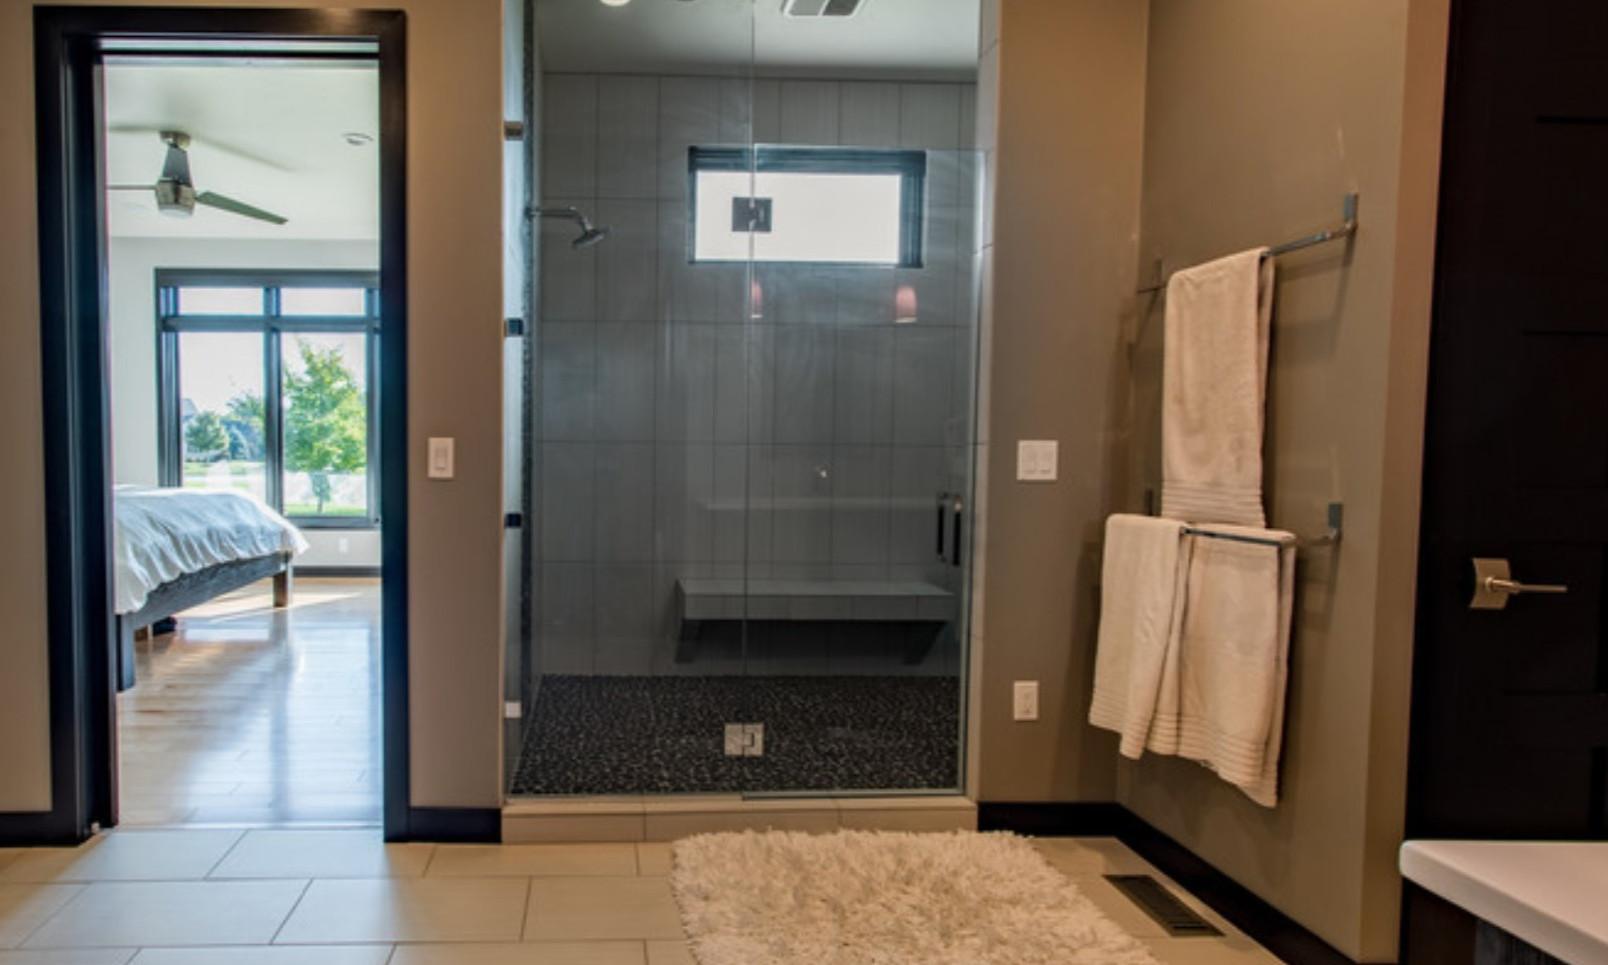 Bathroom sample 1